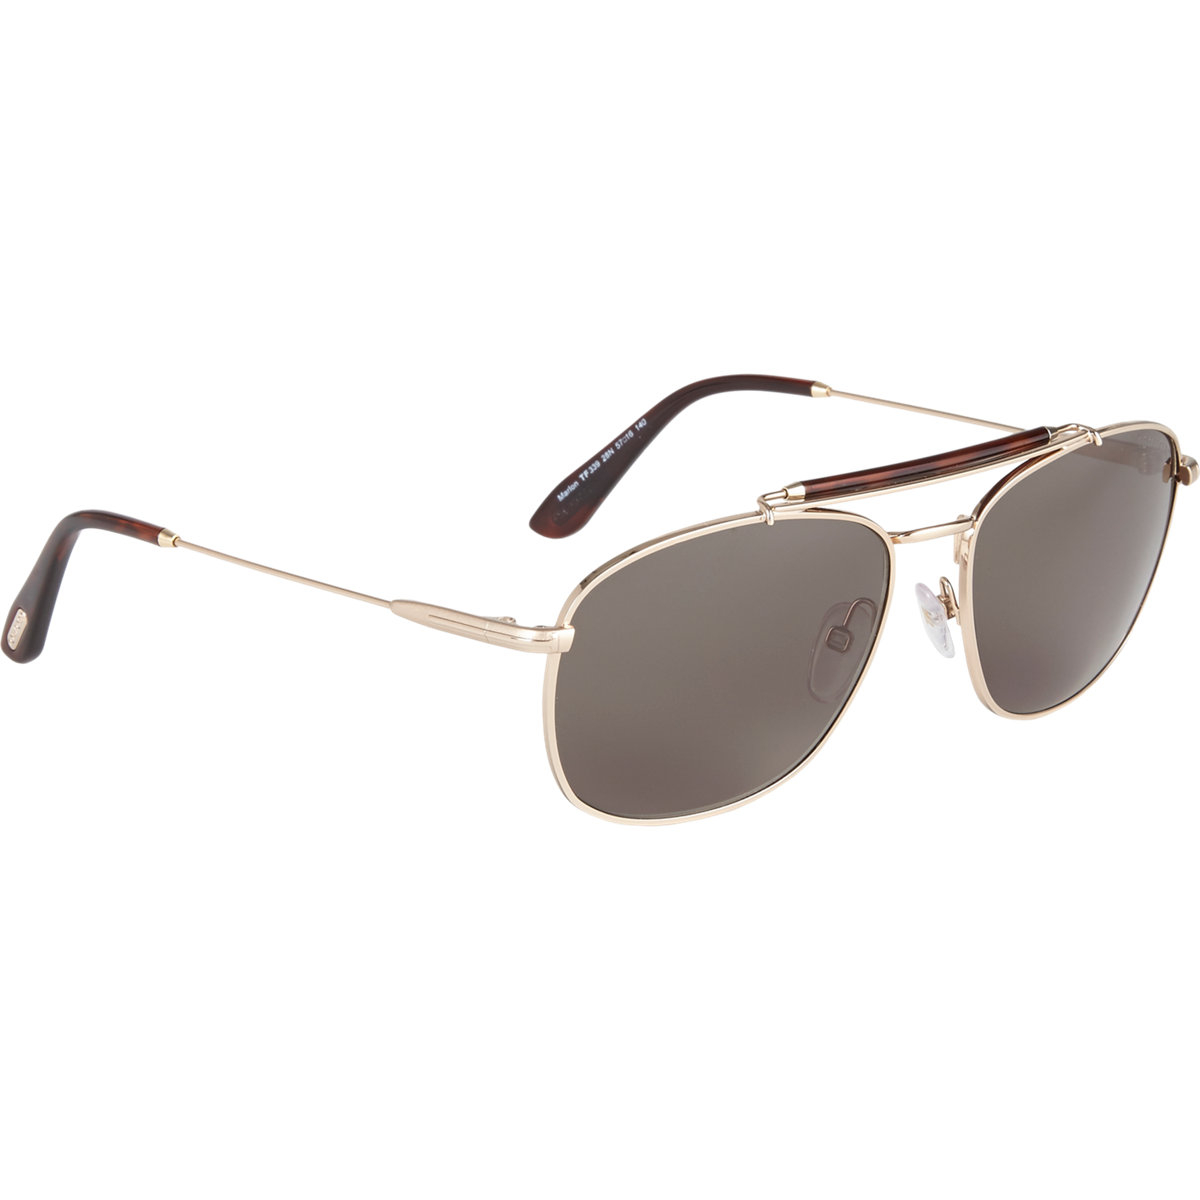 eec2fb35c496b Tom Ford Marlon Sunglasses in Metallic for Men - Lyst